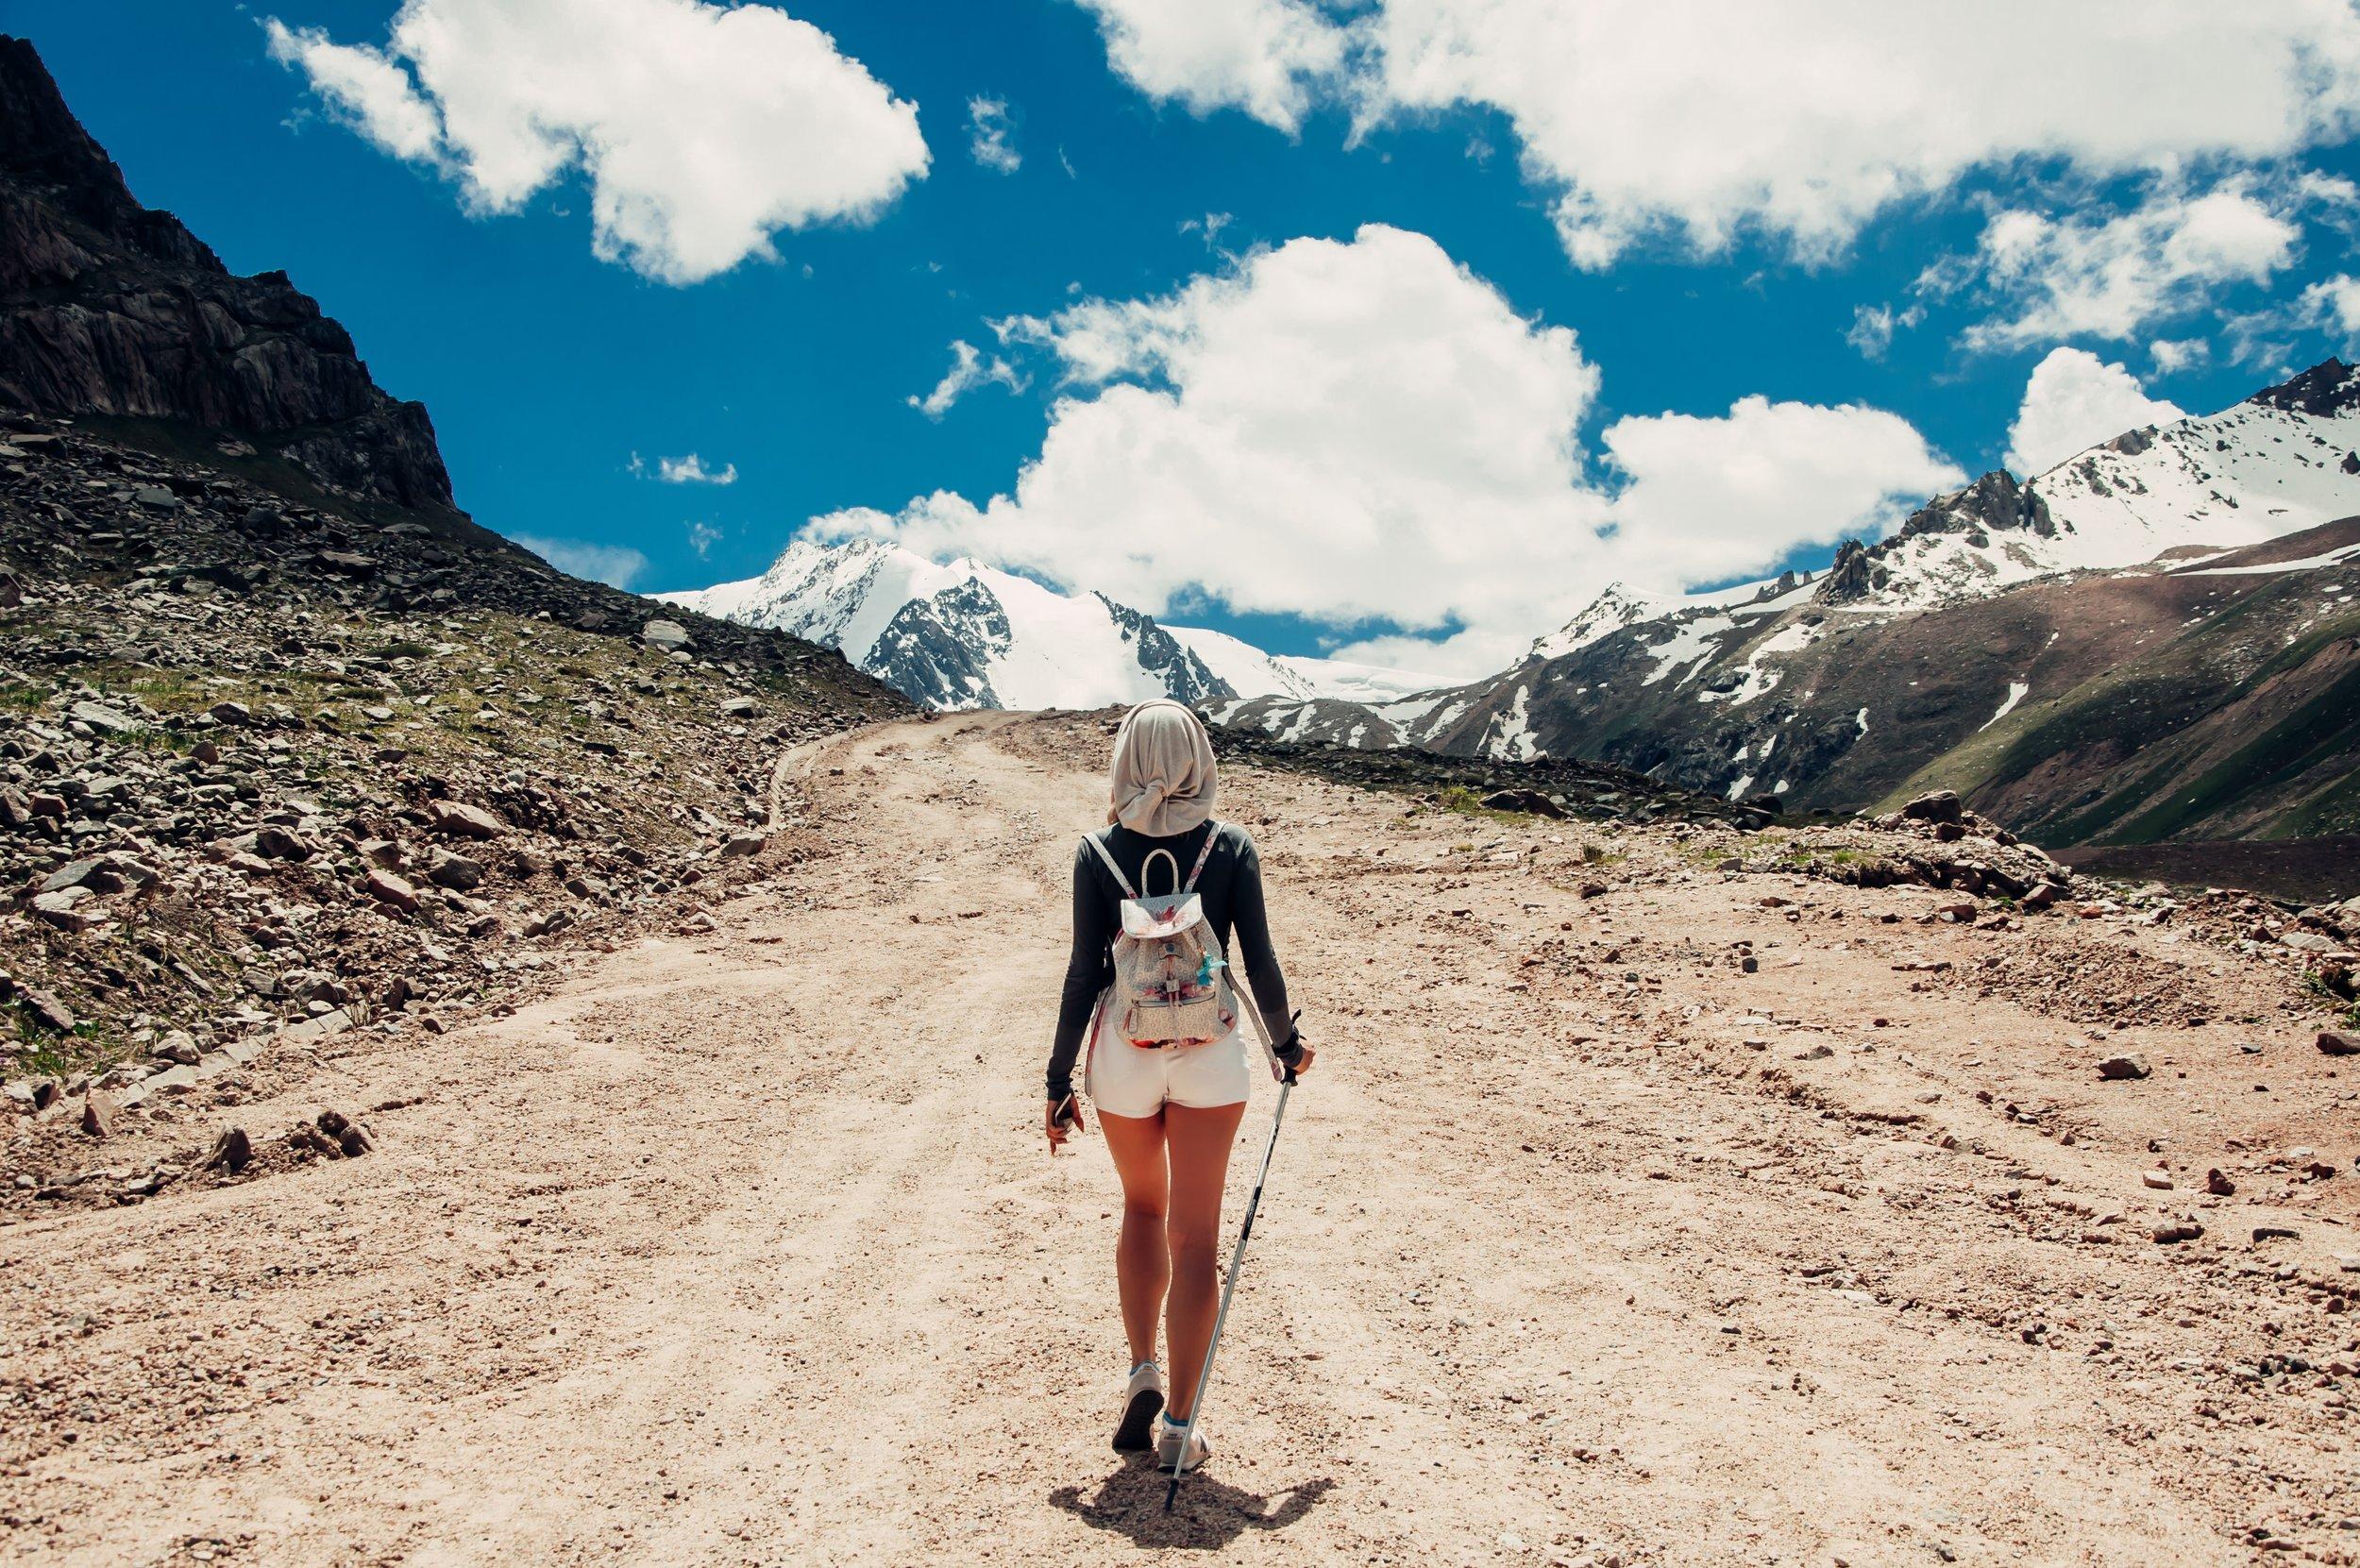 adventure-climb-daylight-1183986.jpg